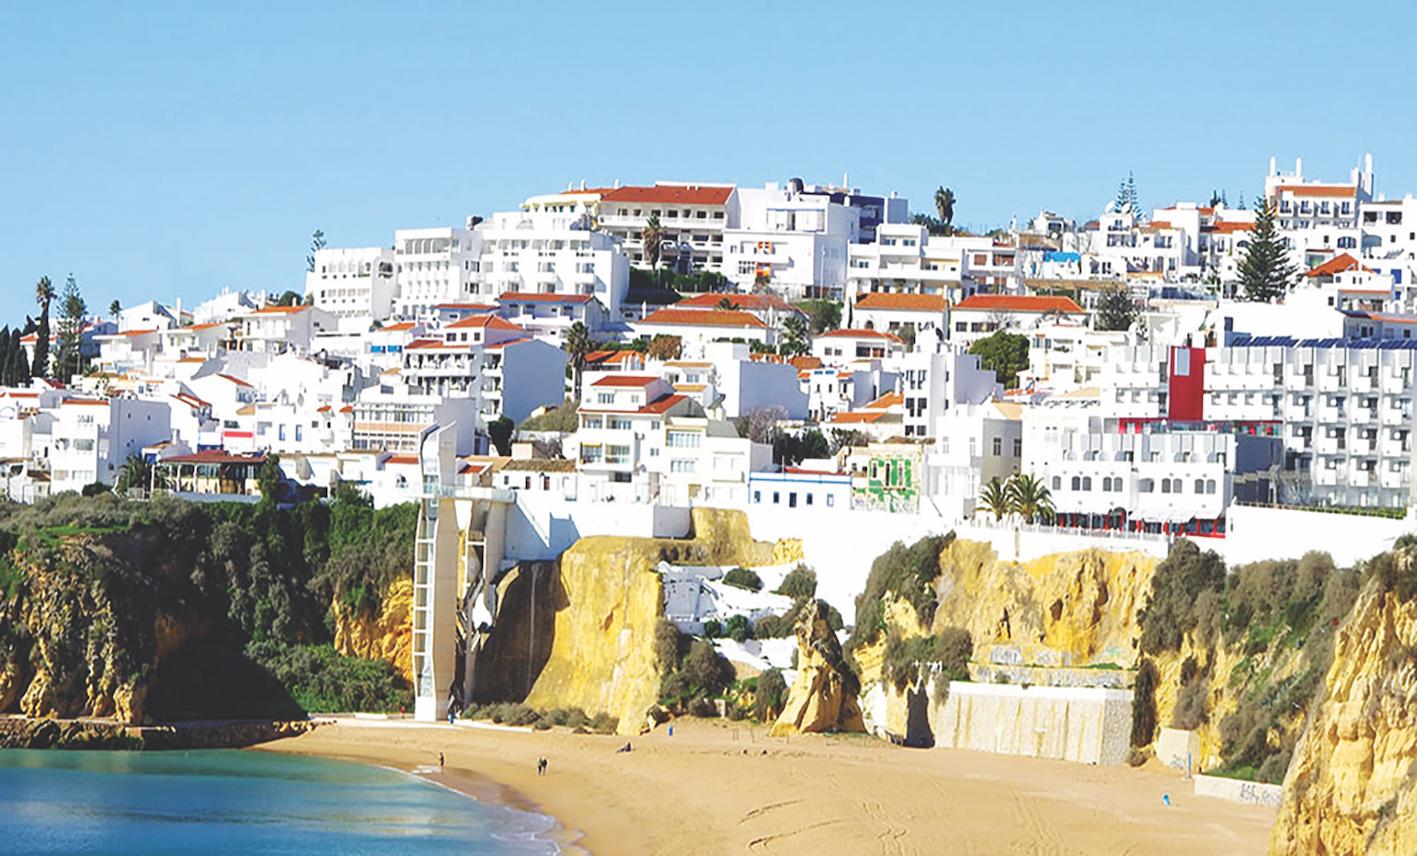 Faro  the capital of the Algarve region